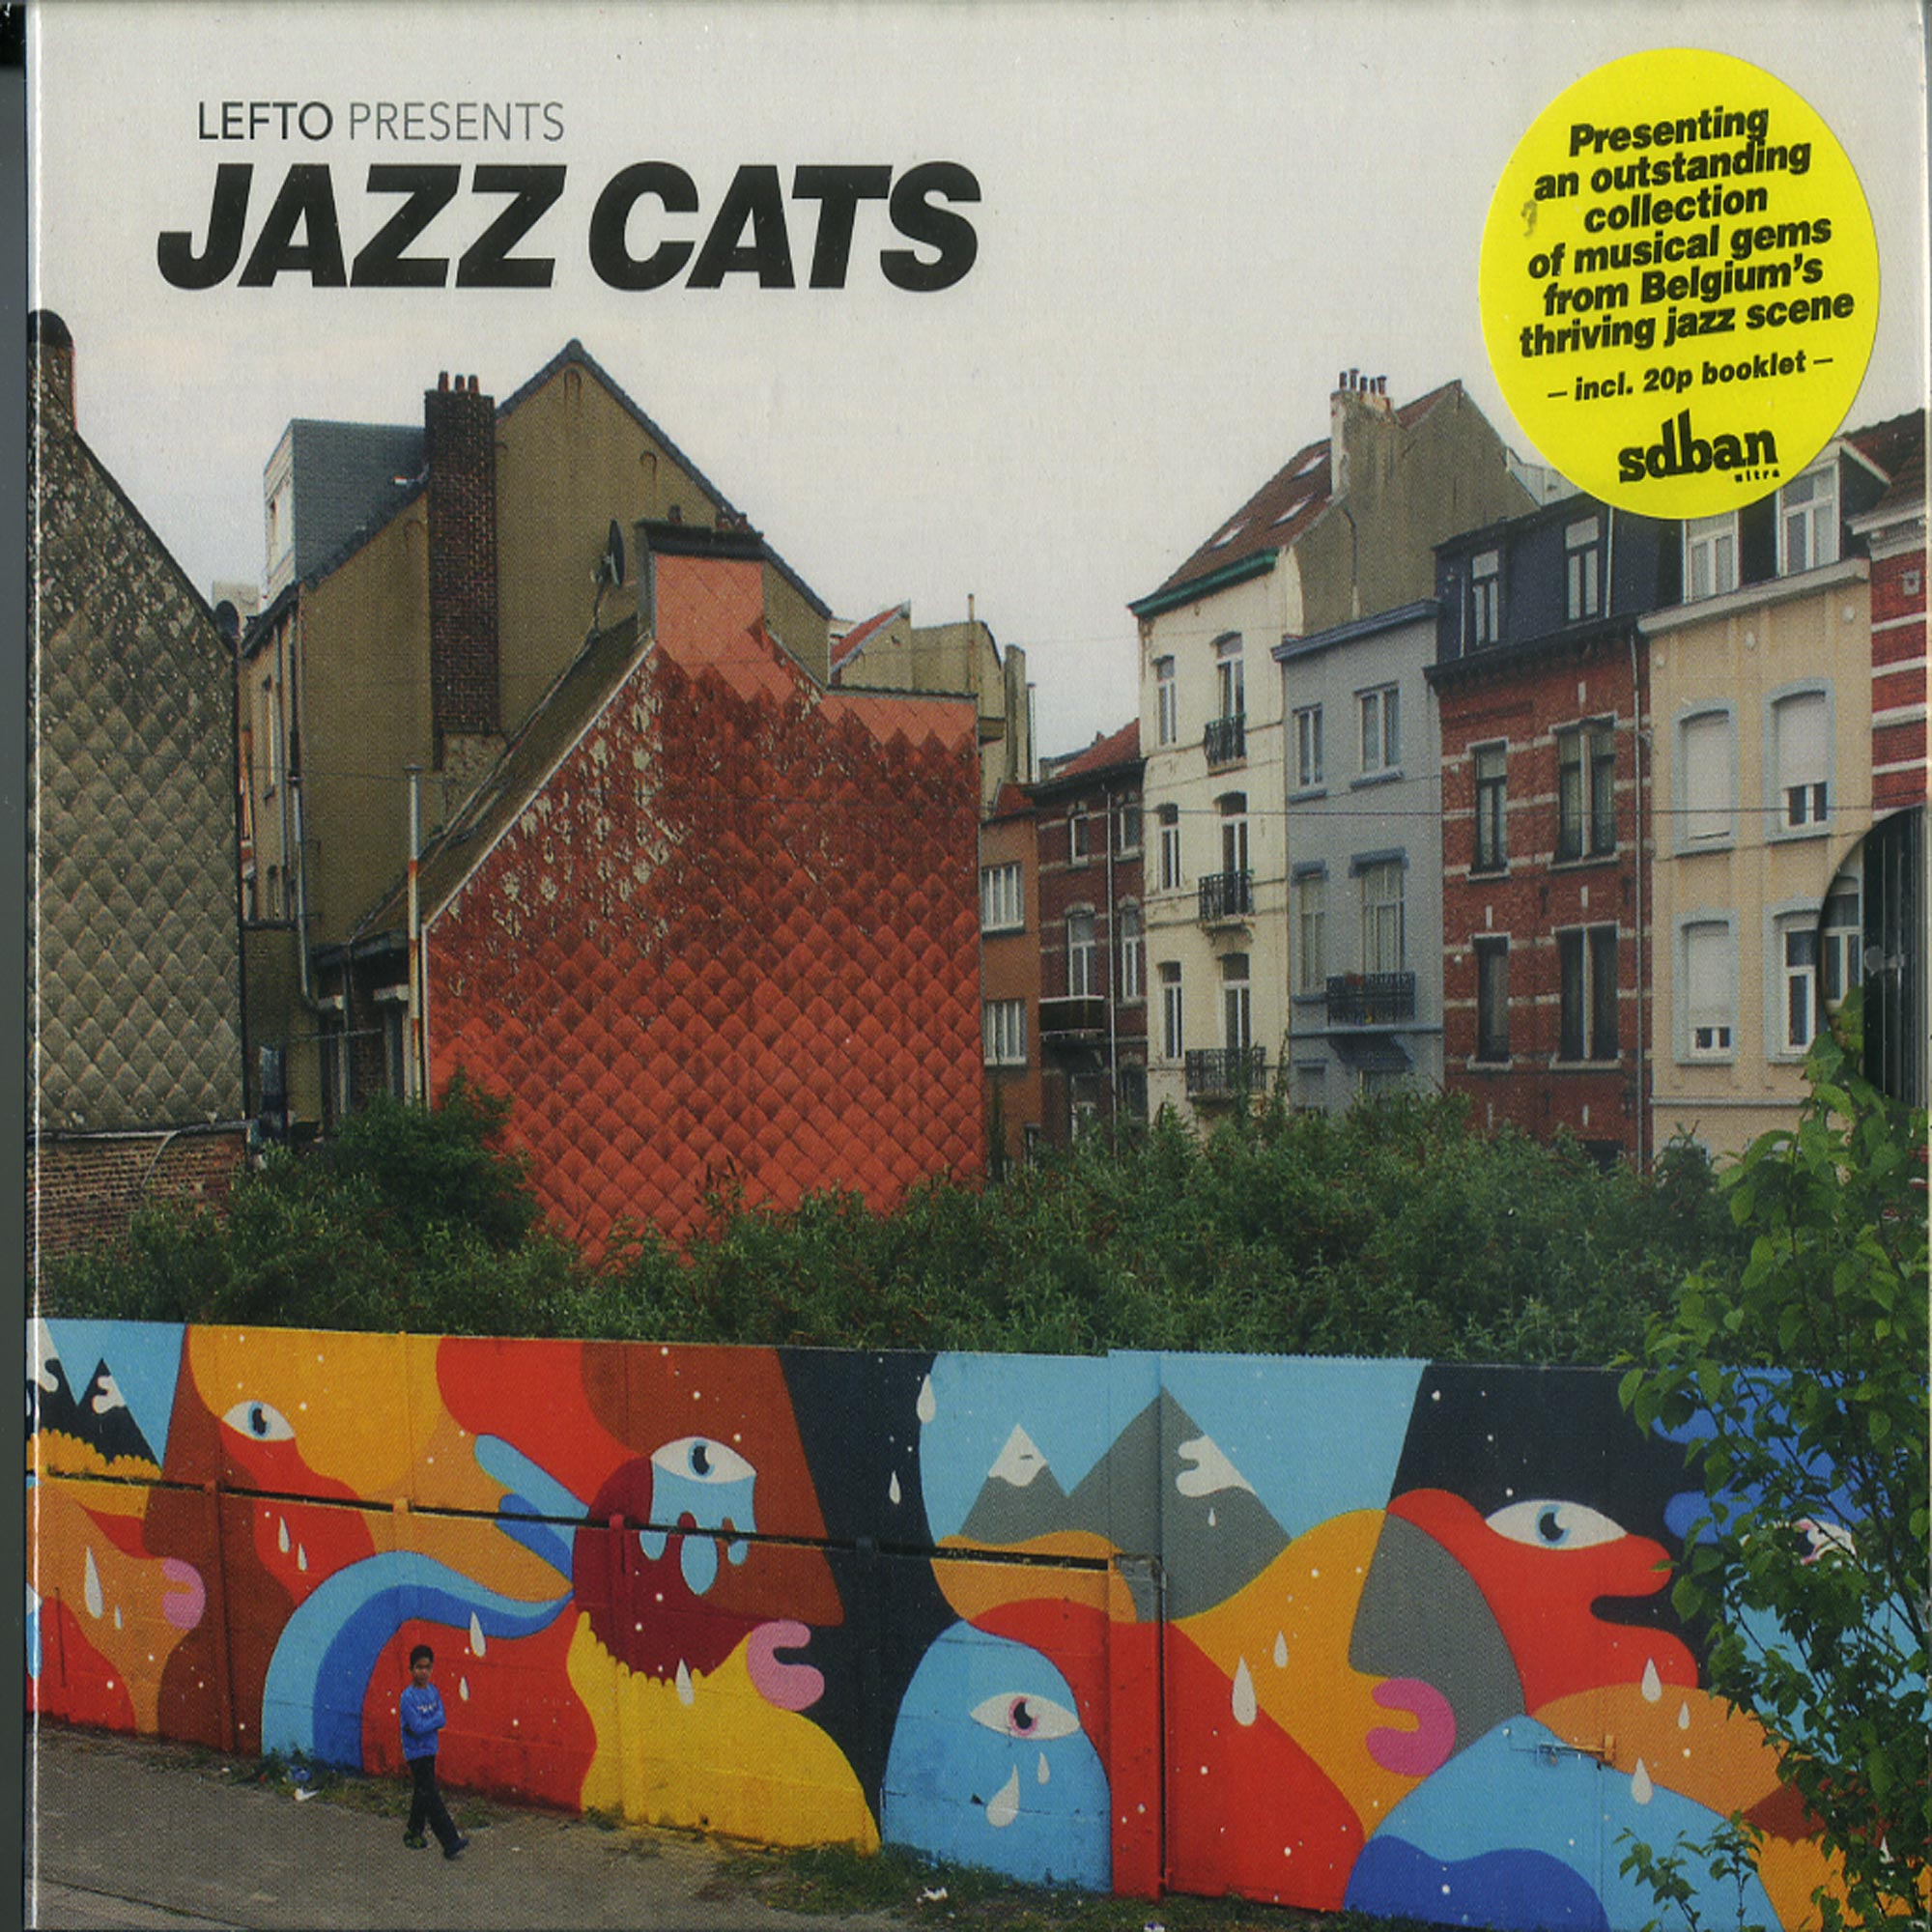 Various Artist - LEFTO PRESENTS JAZZ CATS